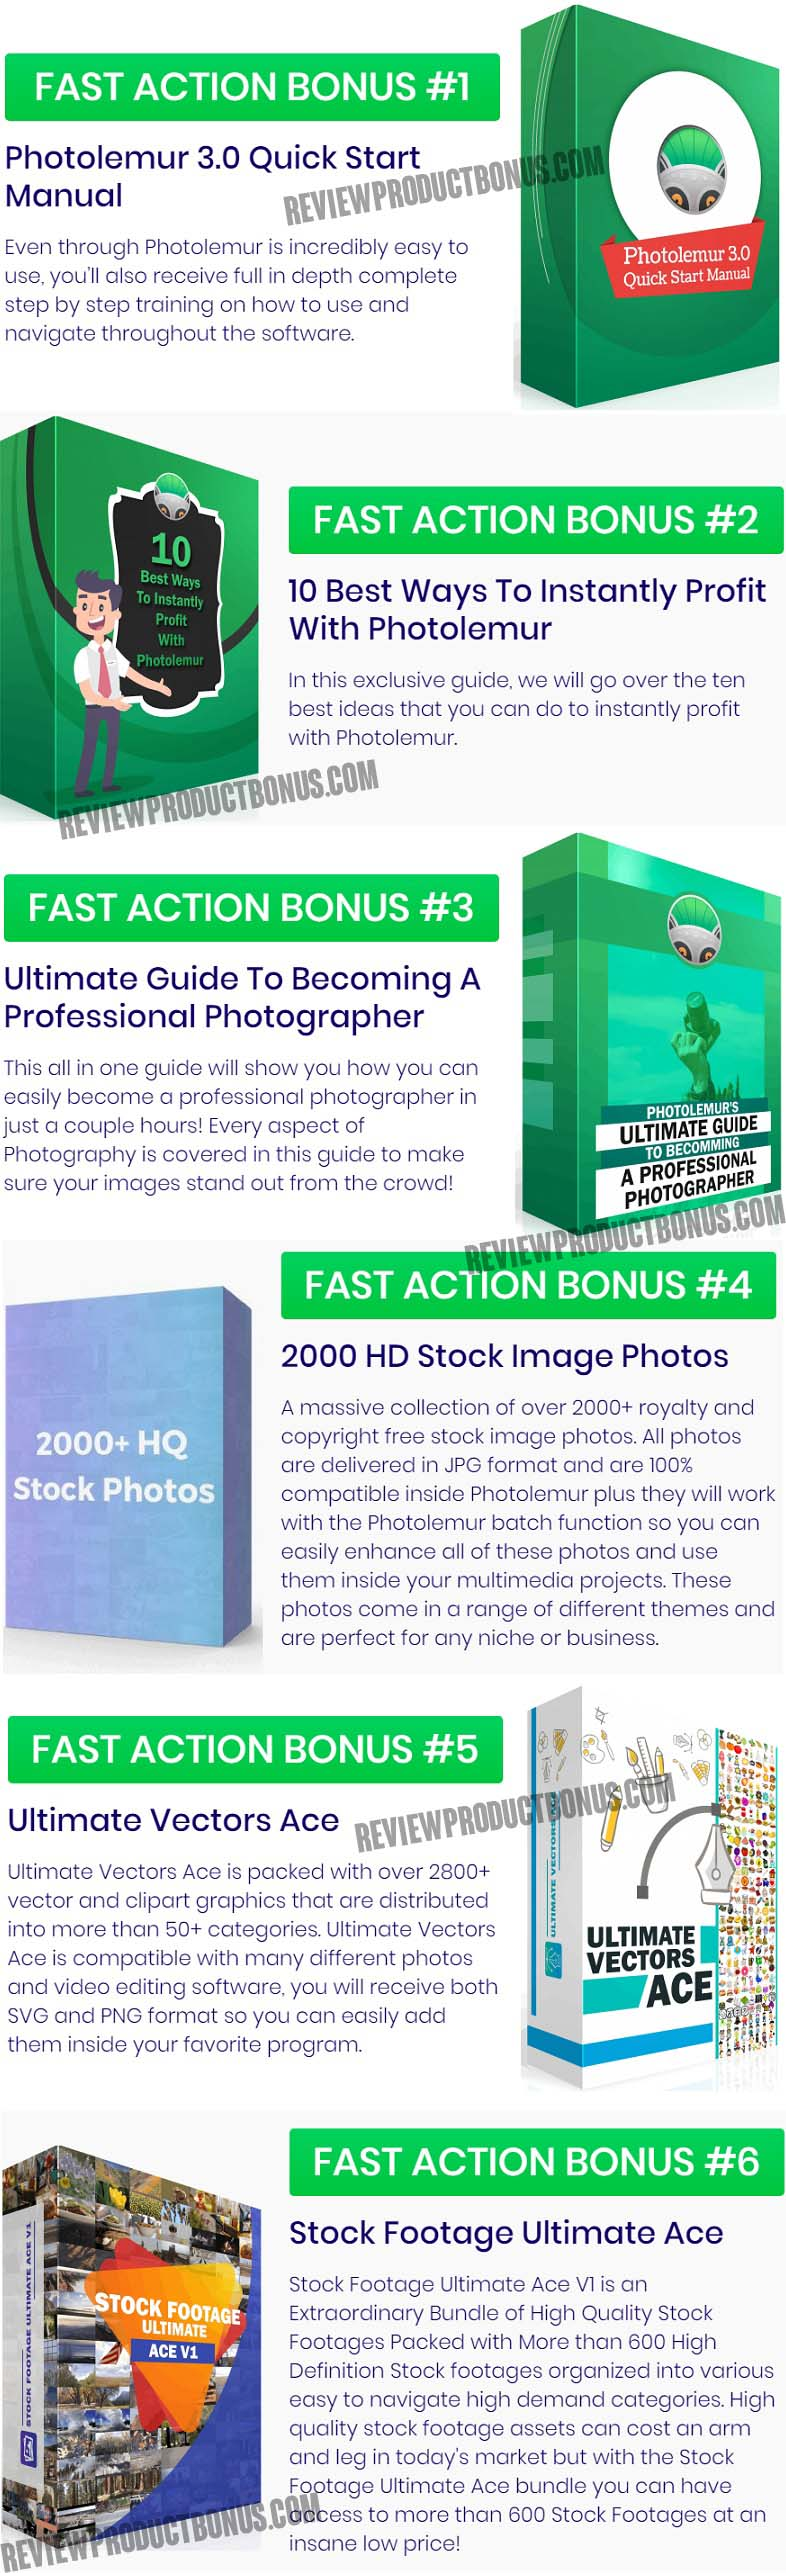 Photolemur 3 Bonus